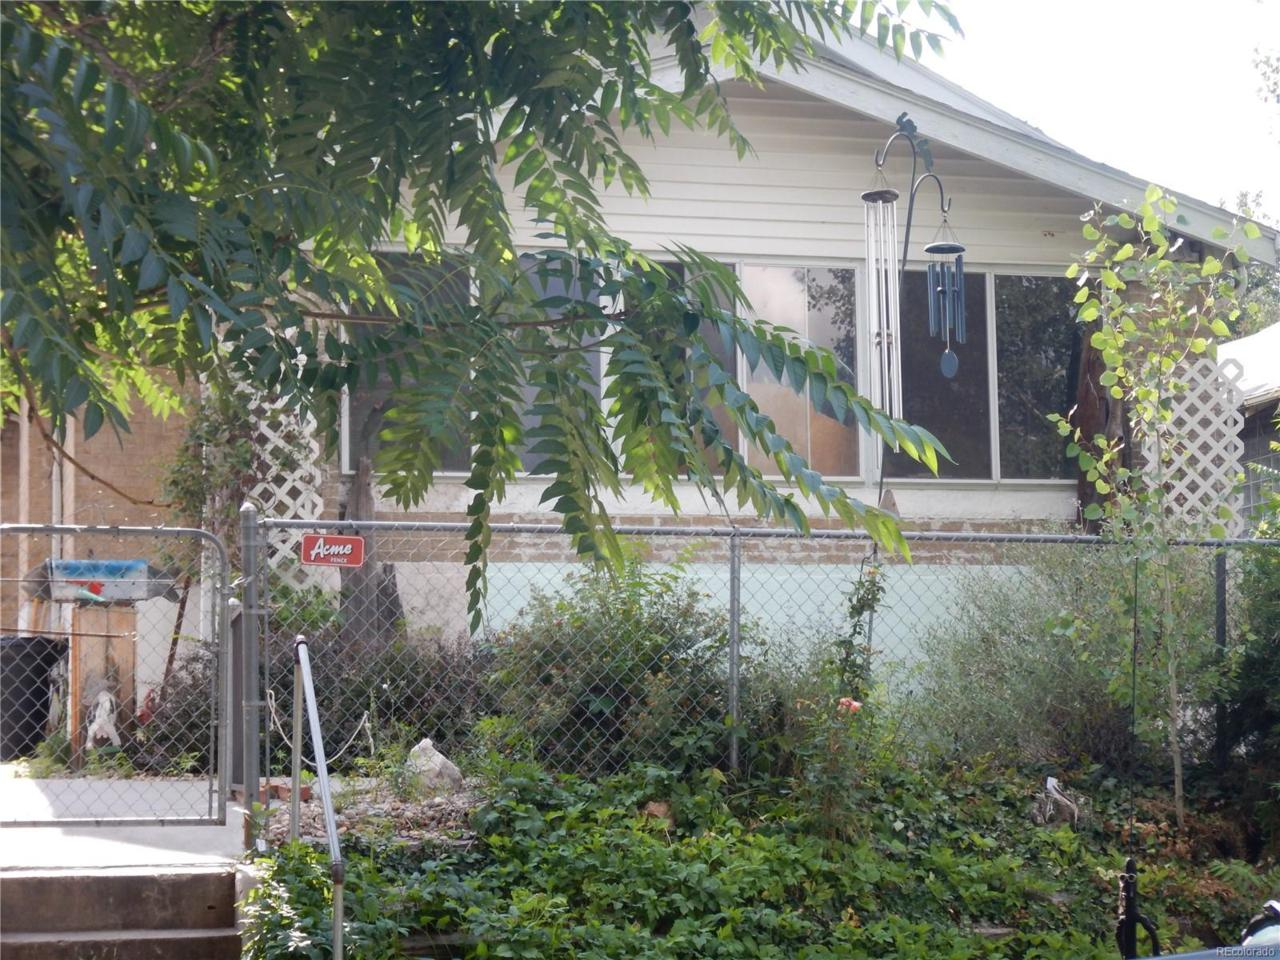 3289 Meade Street, Denver, CO 80211 (MLS #9020634) :: 8z Real Estate